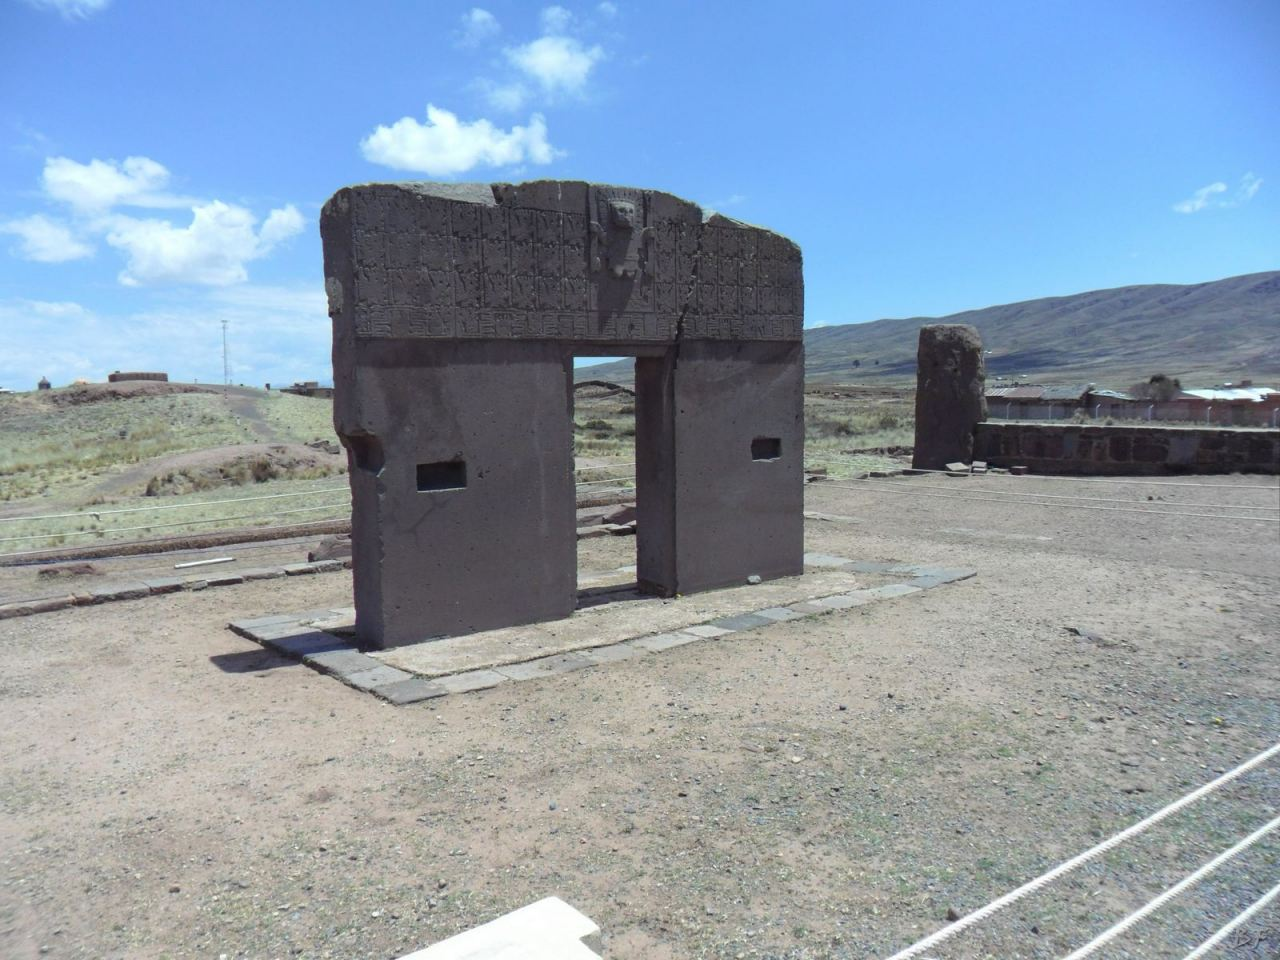 Sito-Megalitico-Piramide-Akapana-Kalasasaya-Menhir-Tiahuanaco-Bolivia-23